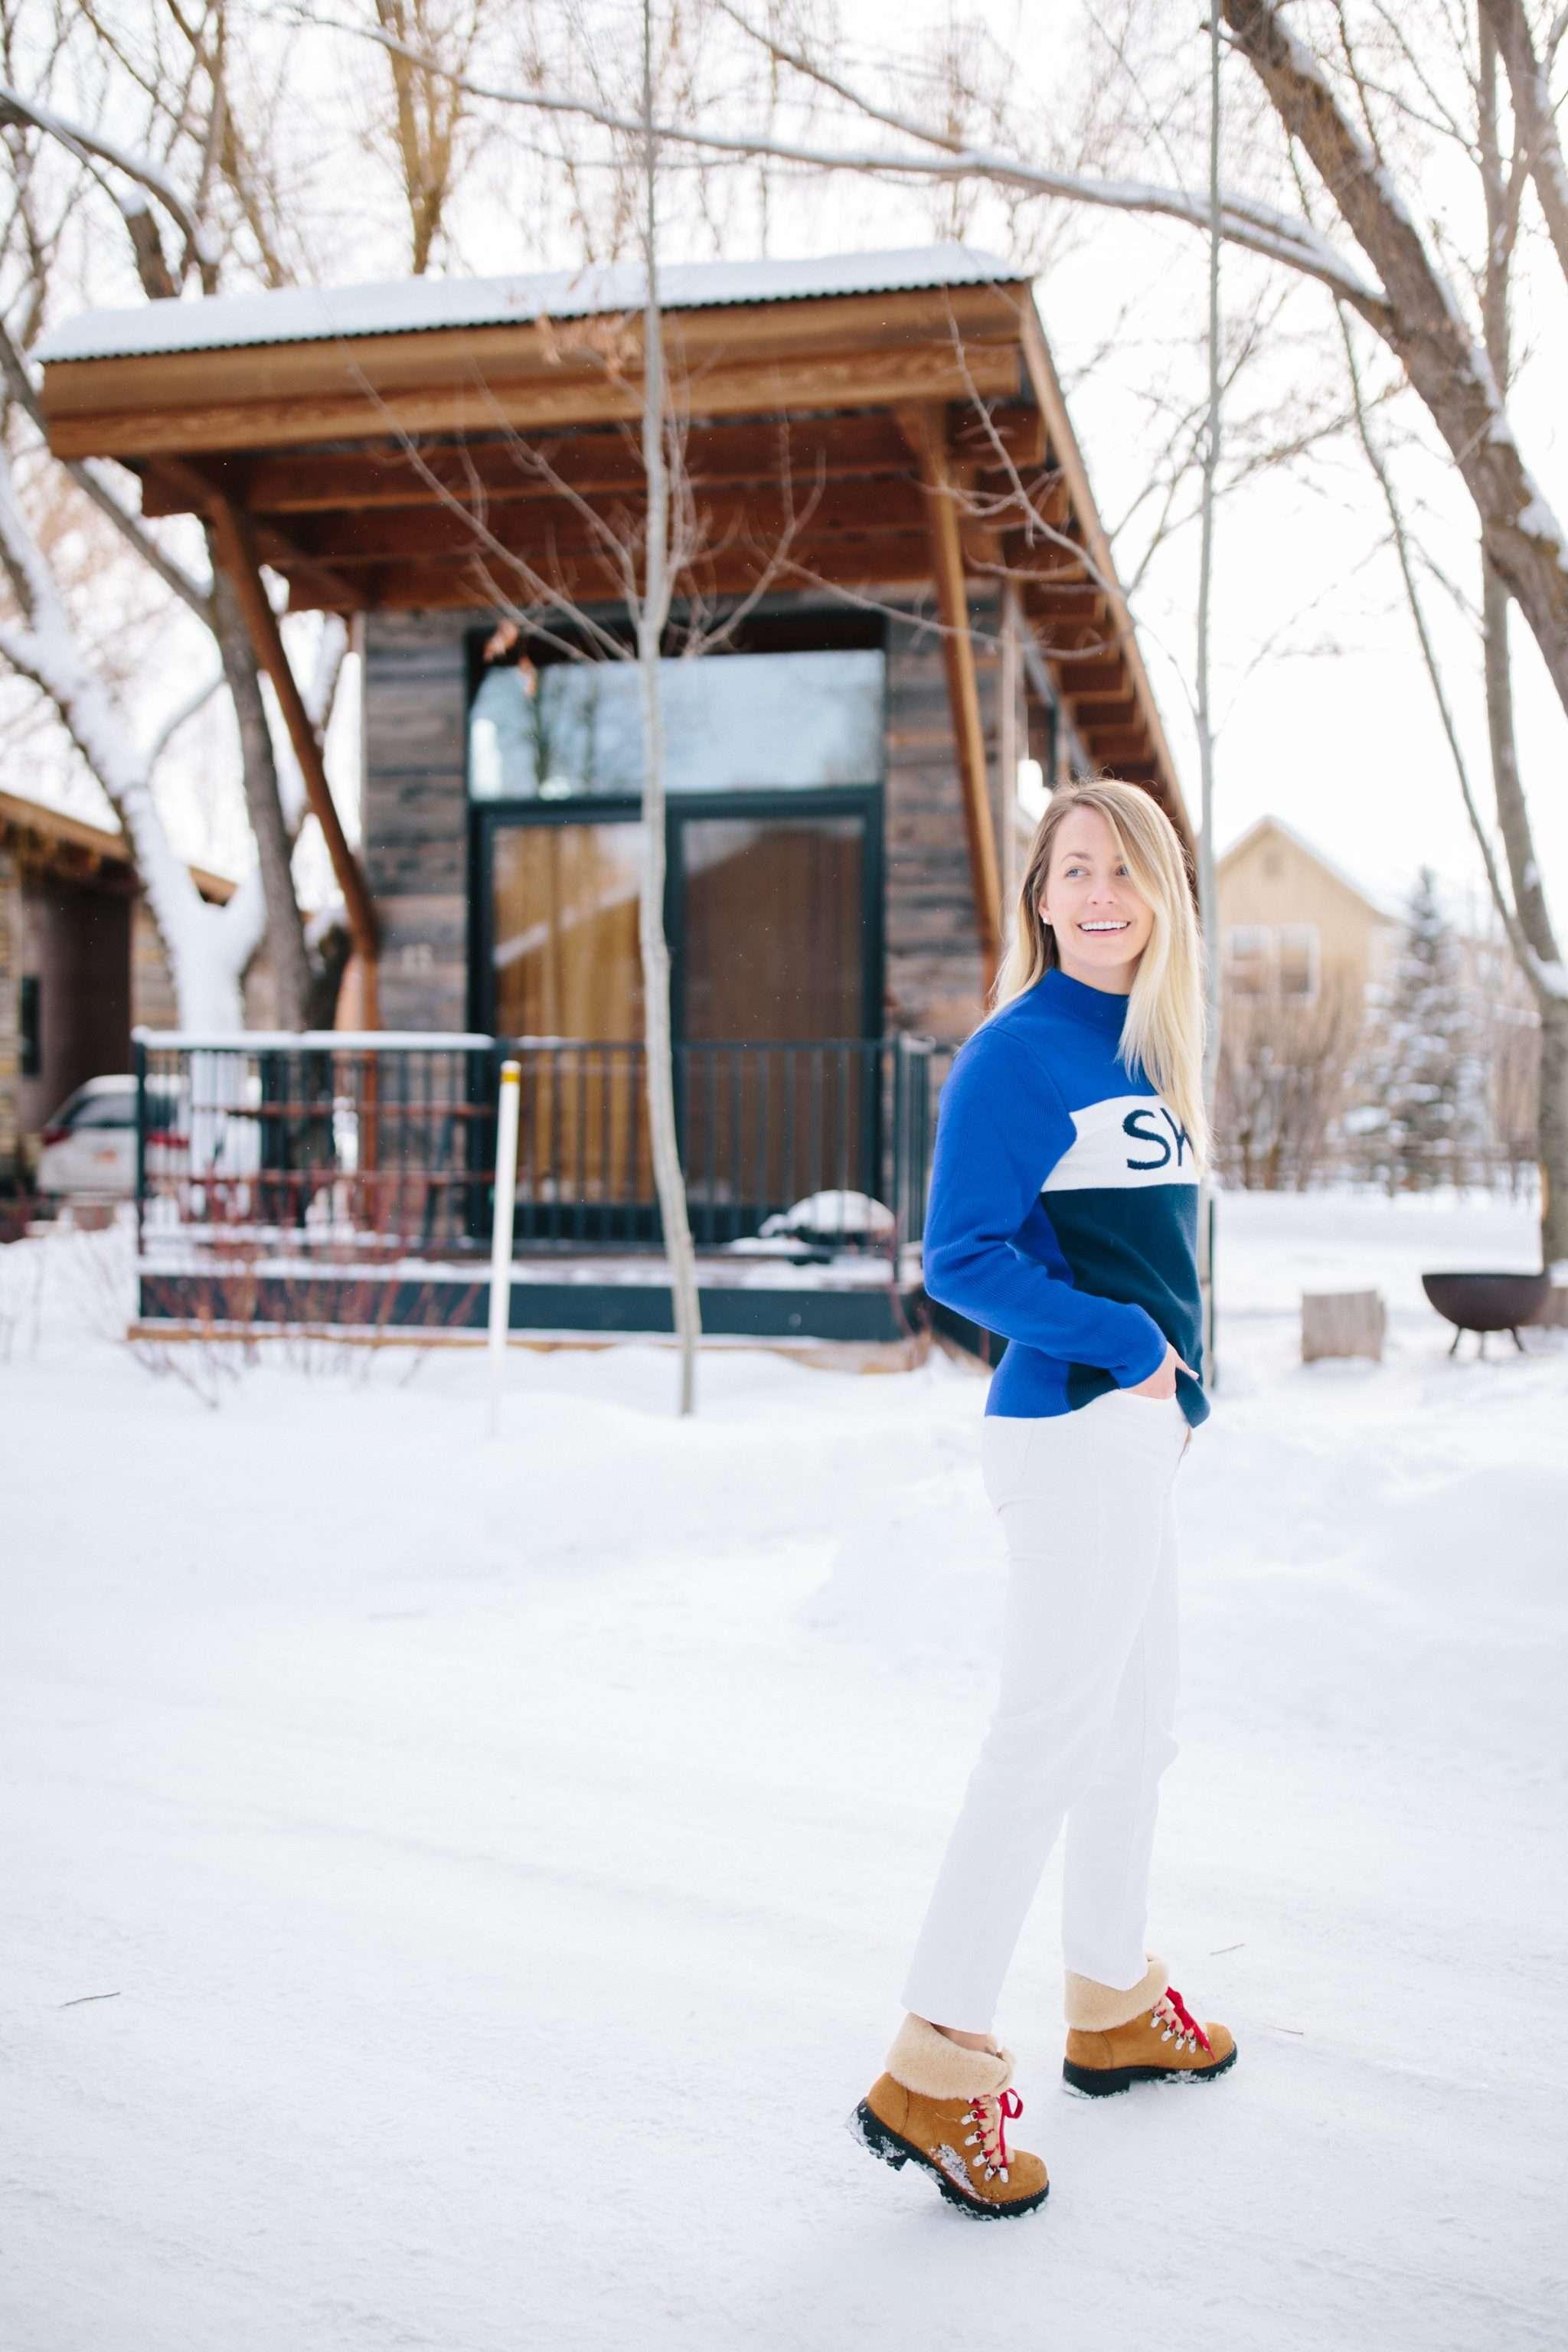 What to wear on a winter ski trip this season | Rhyme & Reason